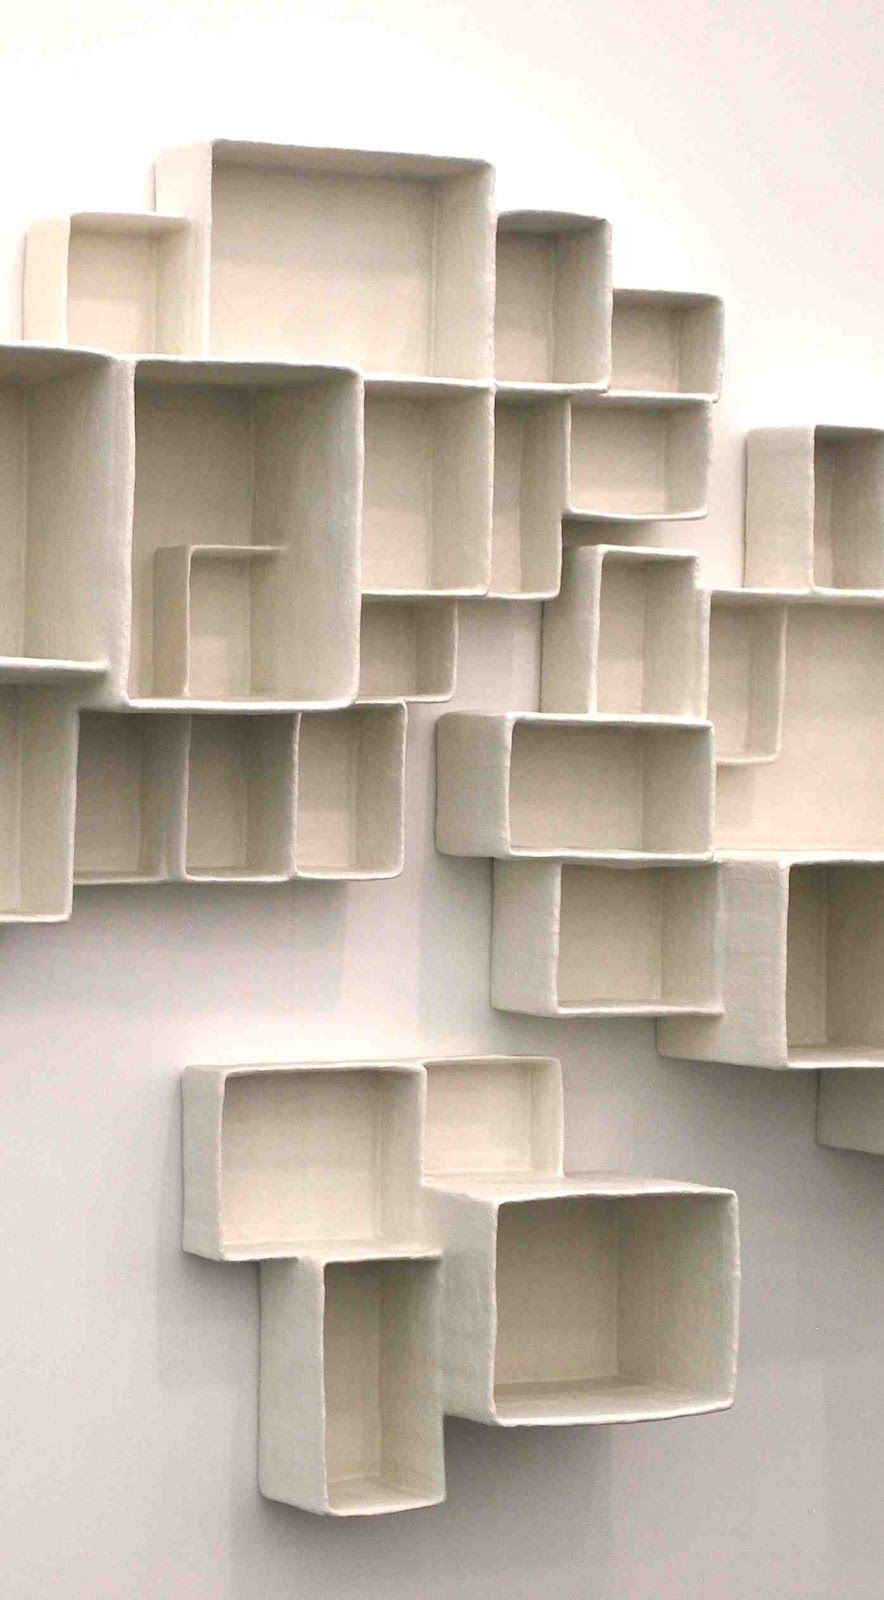 Cool wall storagedisplay rack art shit pinterest art